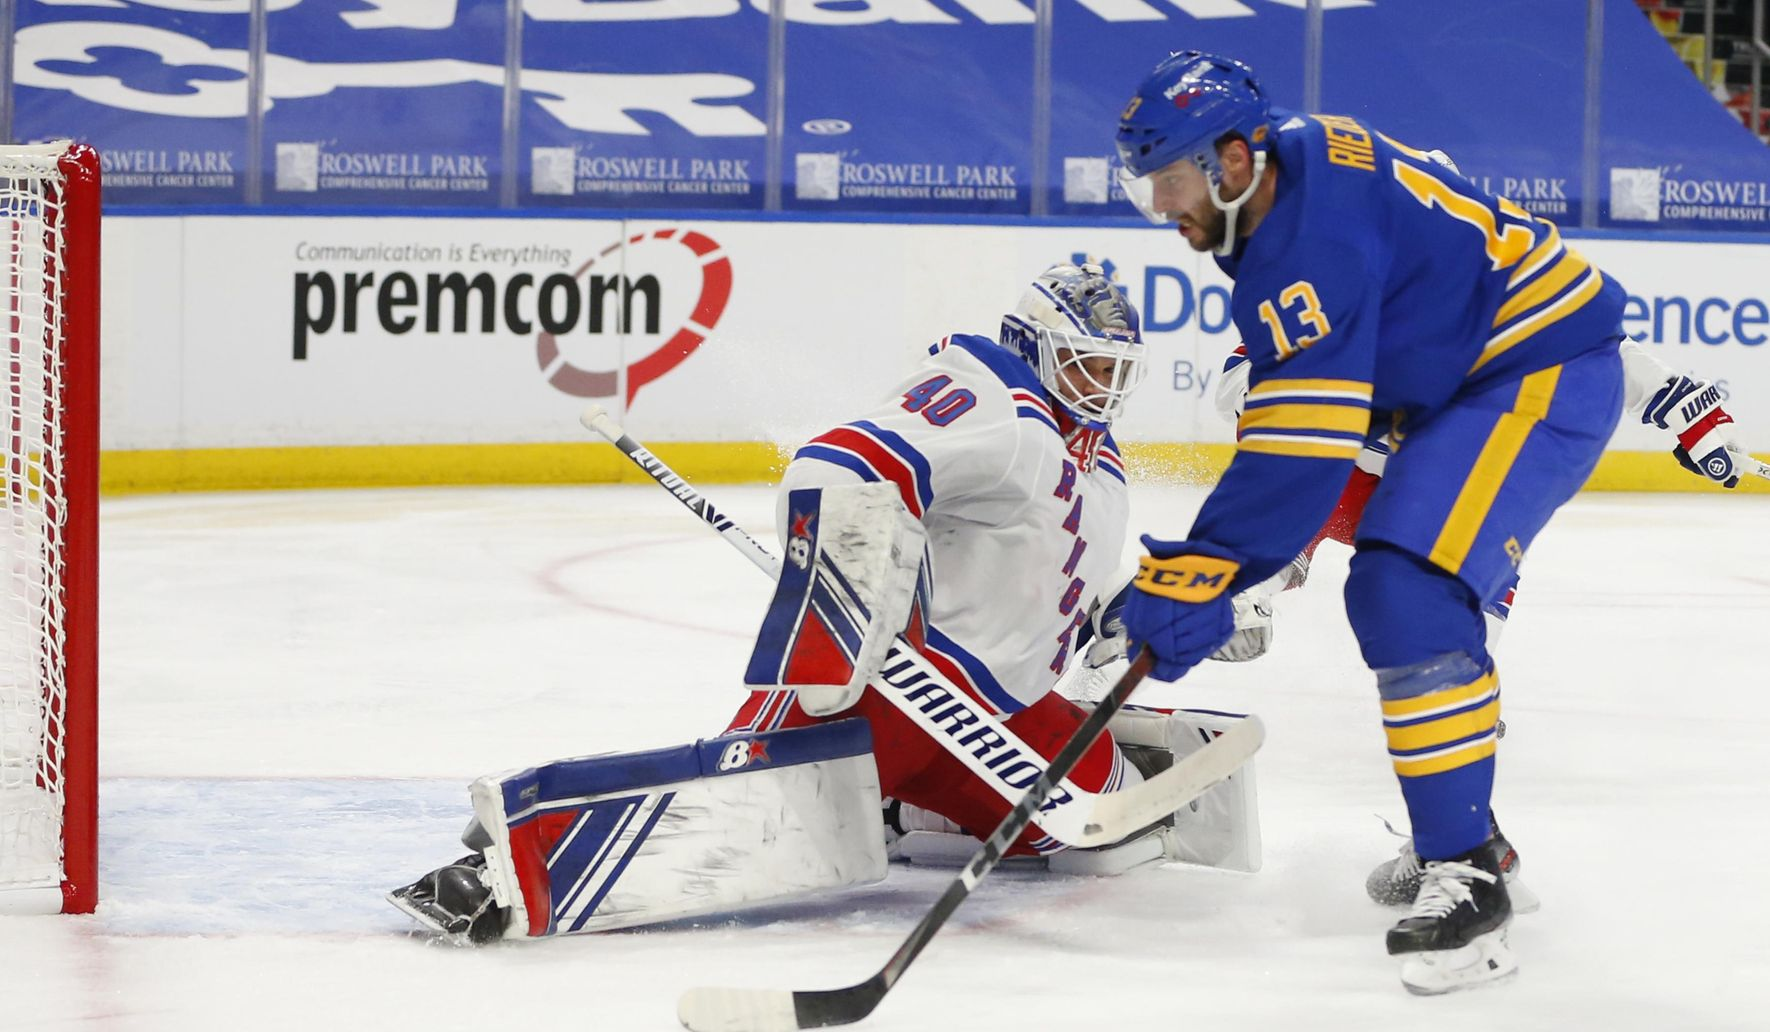 Rangers_sabres_hockey_06371_c0-151-3600-2249_s1770x1032